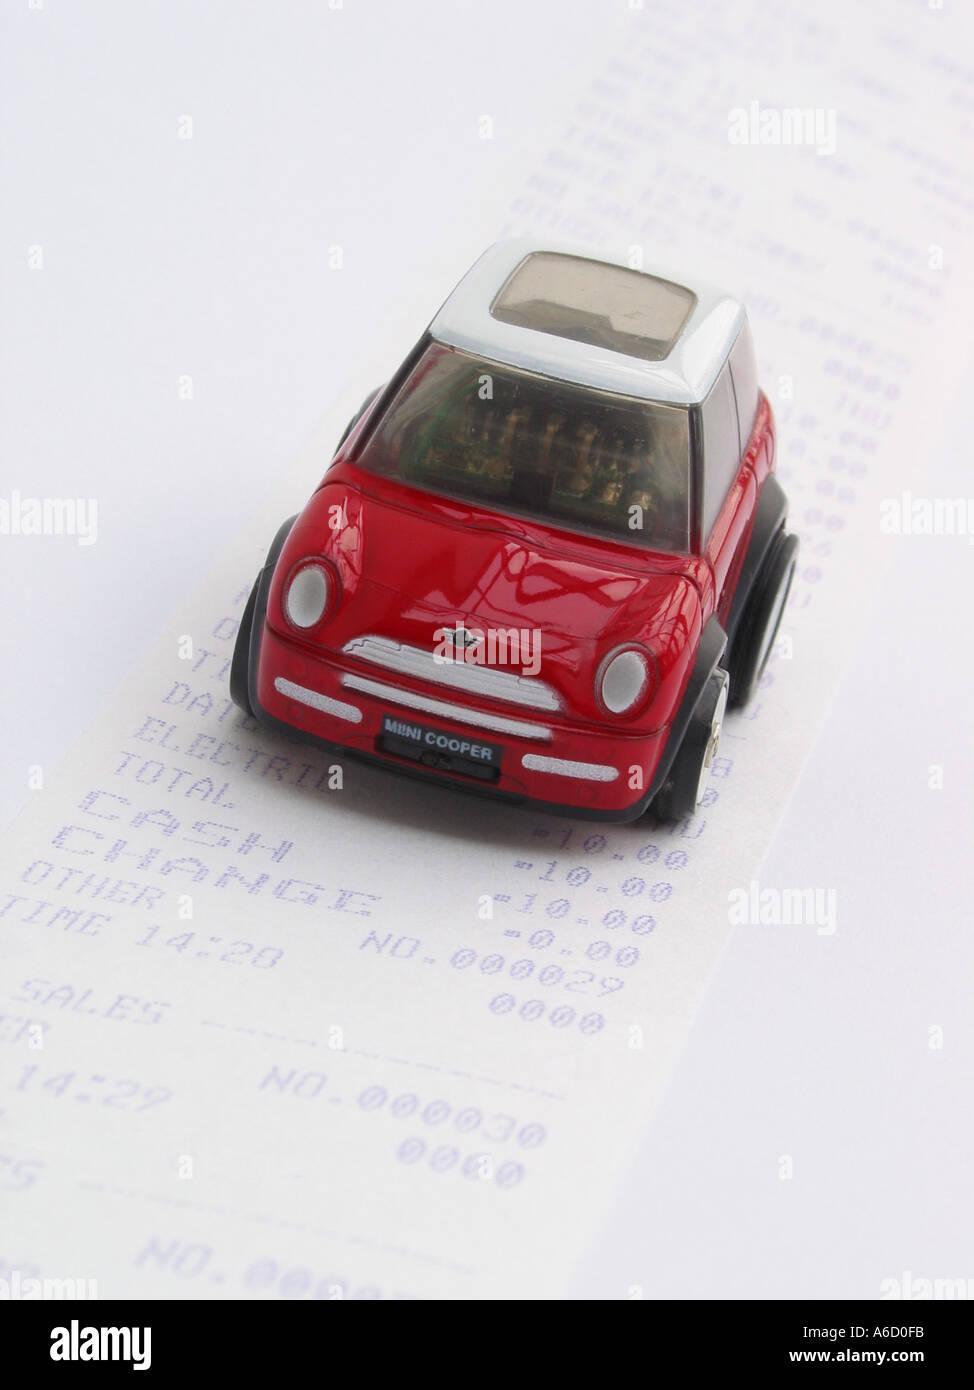 Car driving along a Sales Receipt Stock Photo